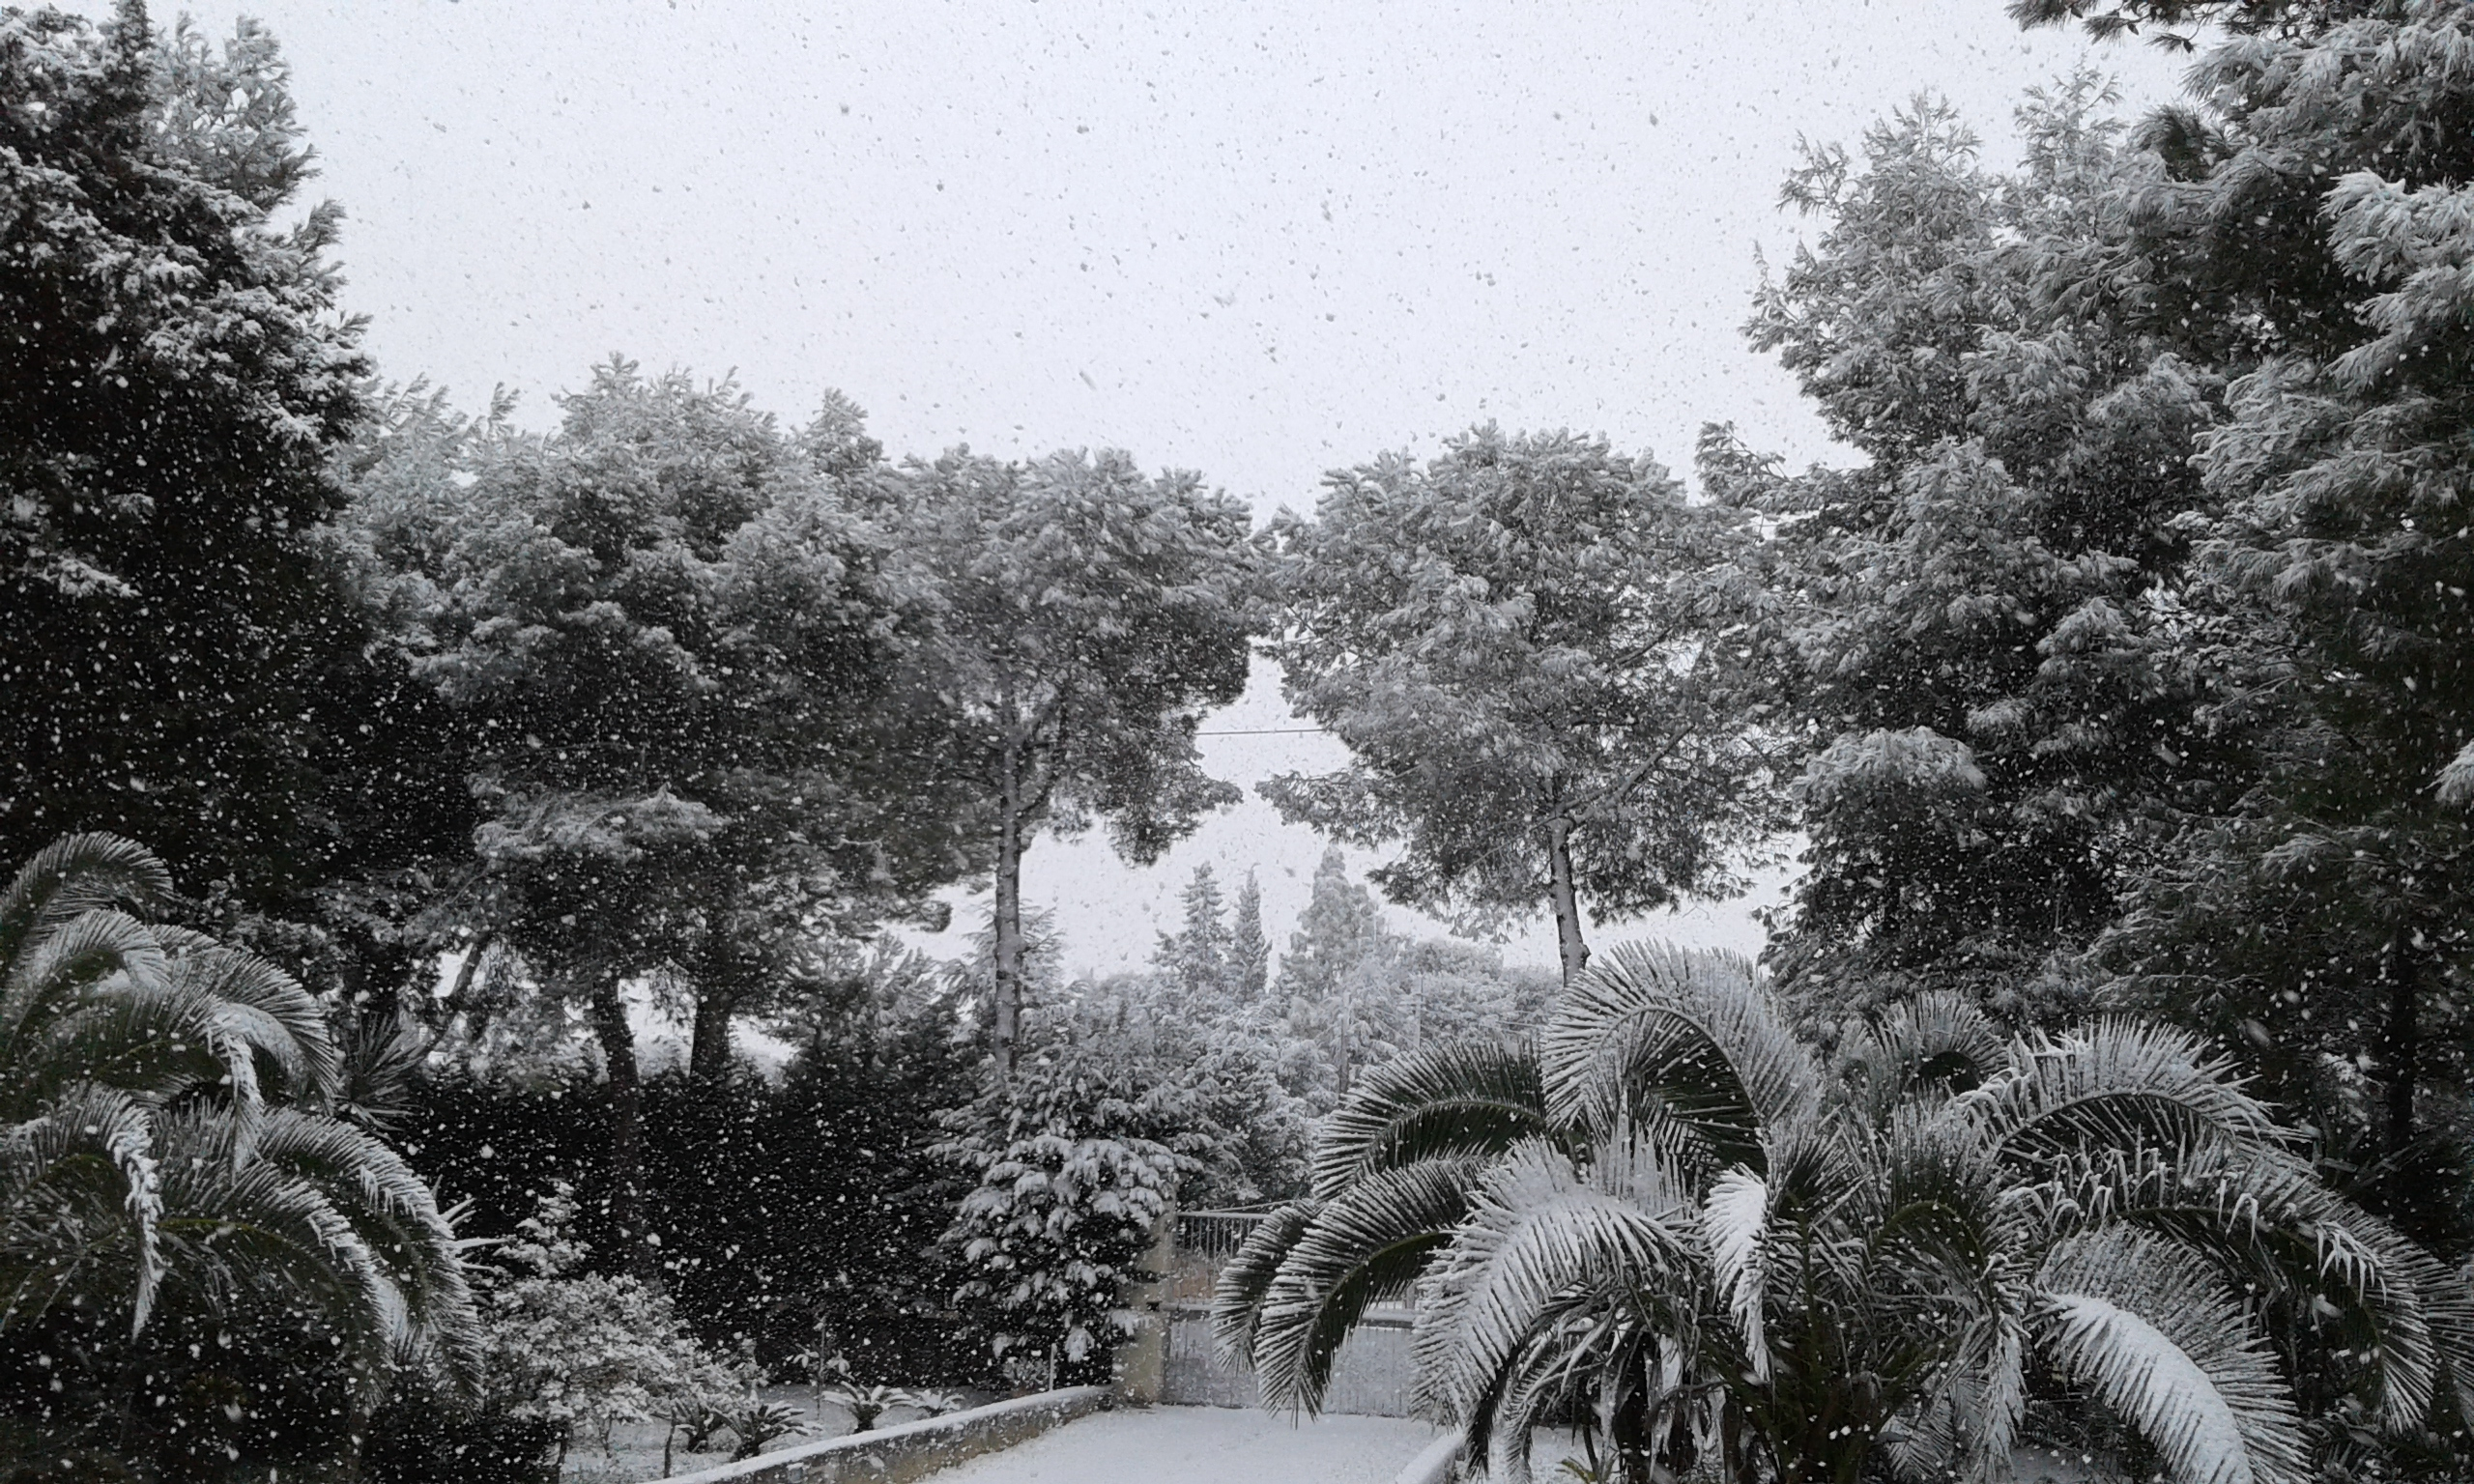 Gelo e neve d'Epifania 2017_qui tutte le FOTO e i VIDEO-20170106_091944.jpg